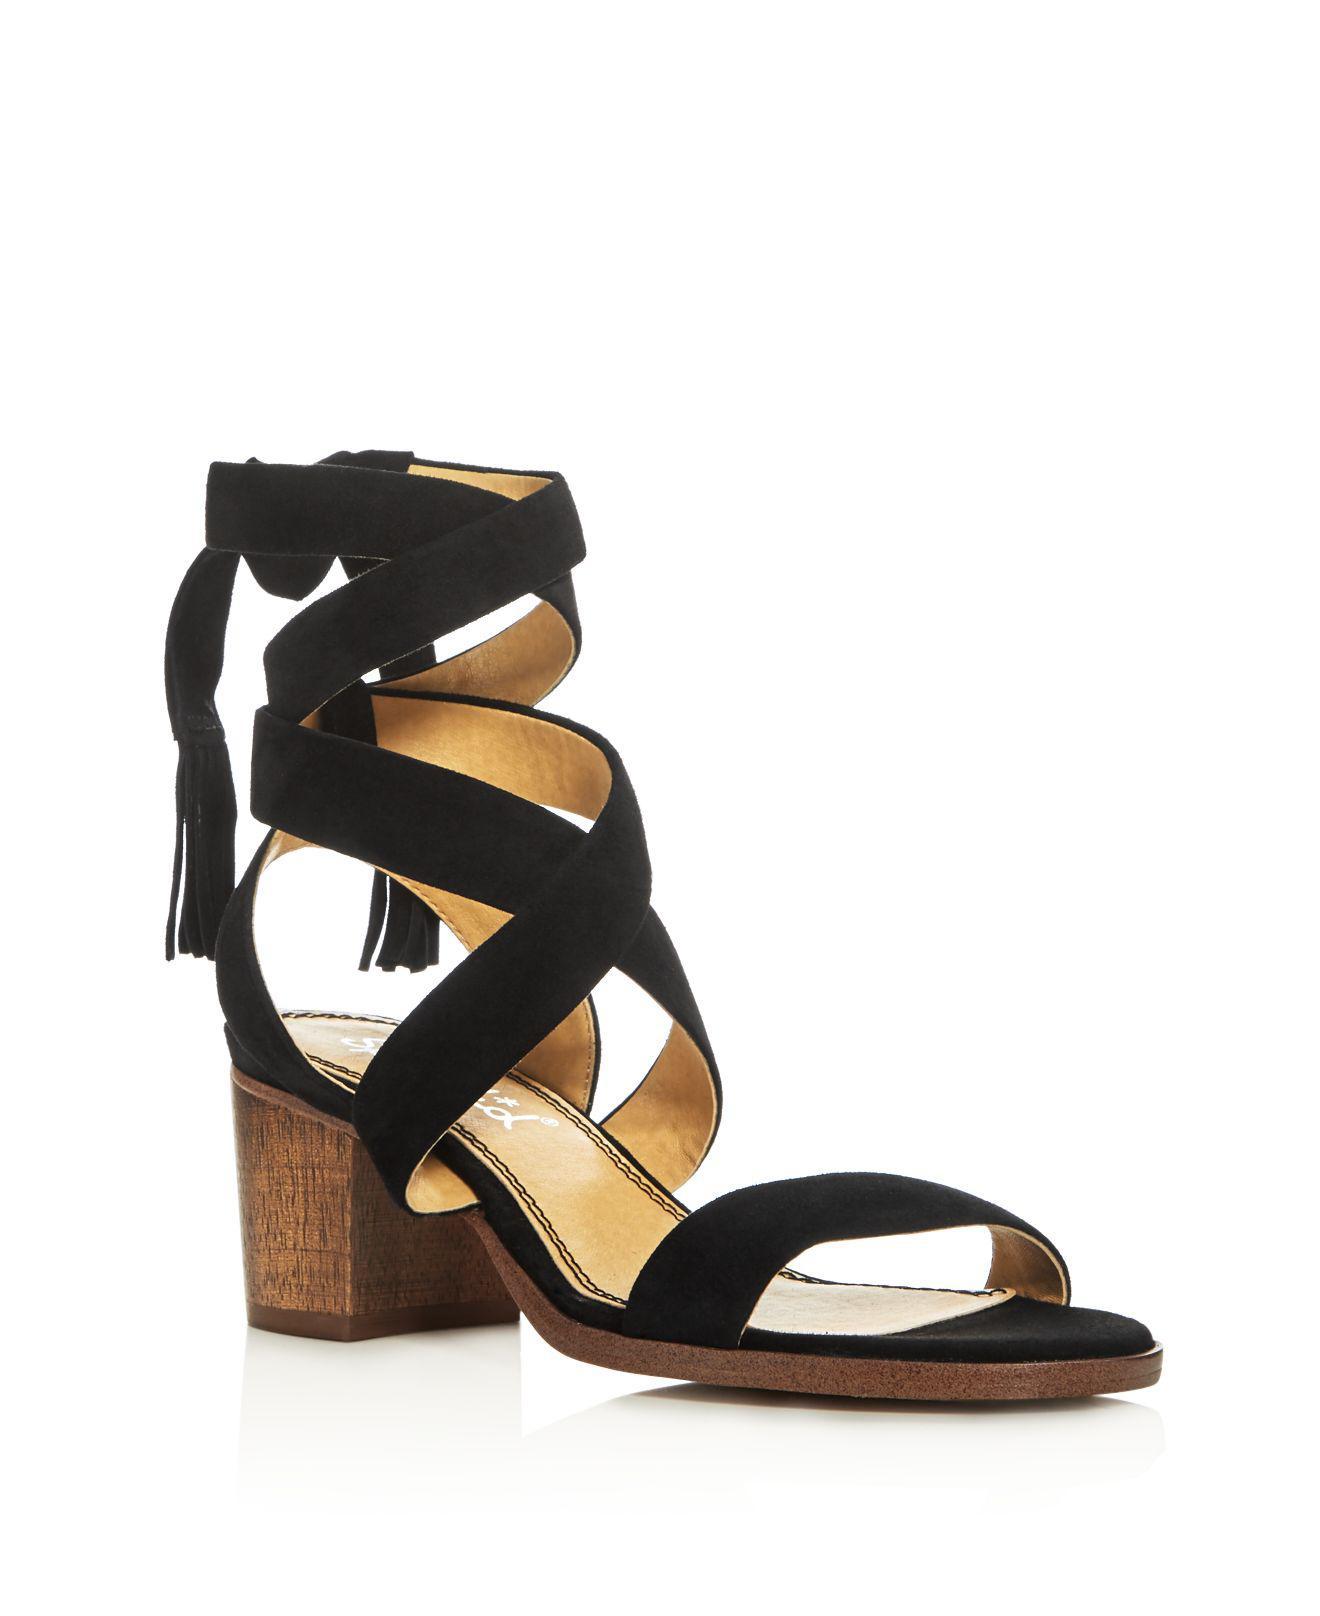 89c4256afe36 Lyst - Splendid Janet Crisscross Ankle Strap Block Heel Sandals in Black